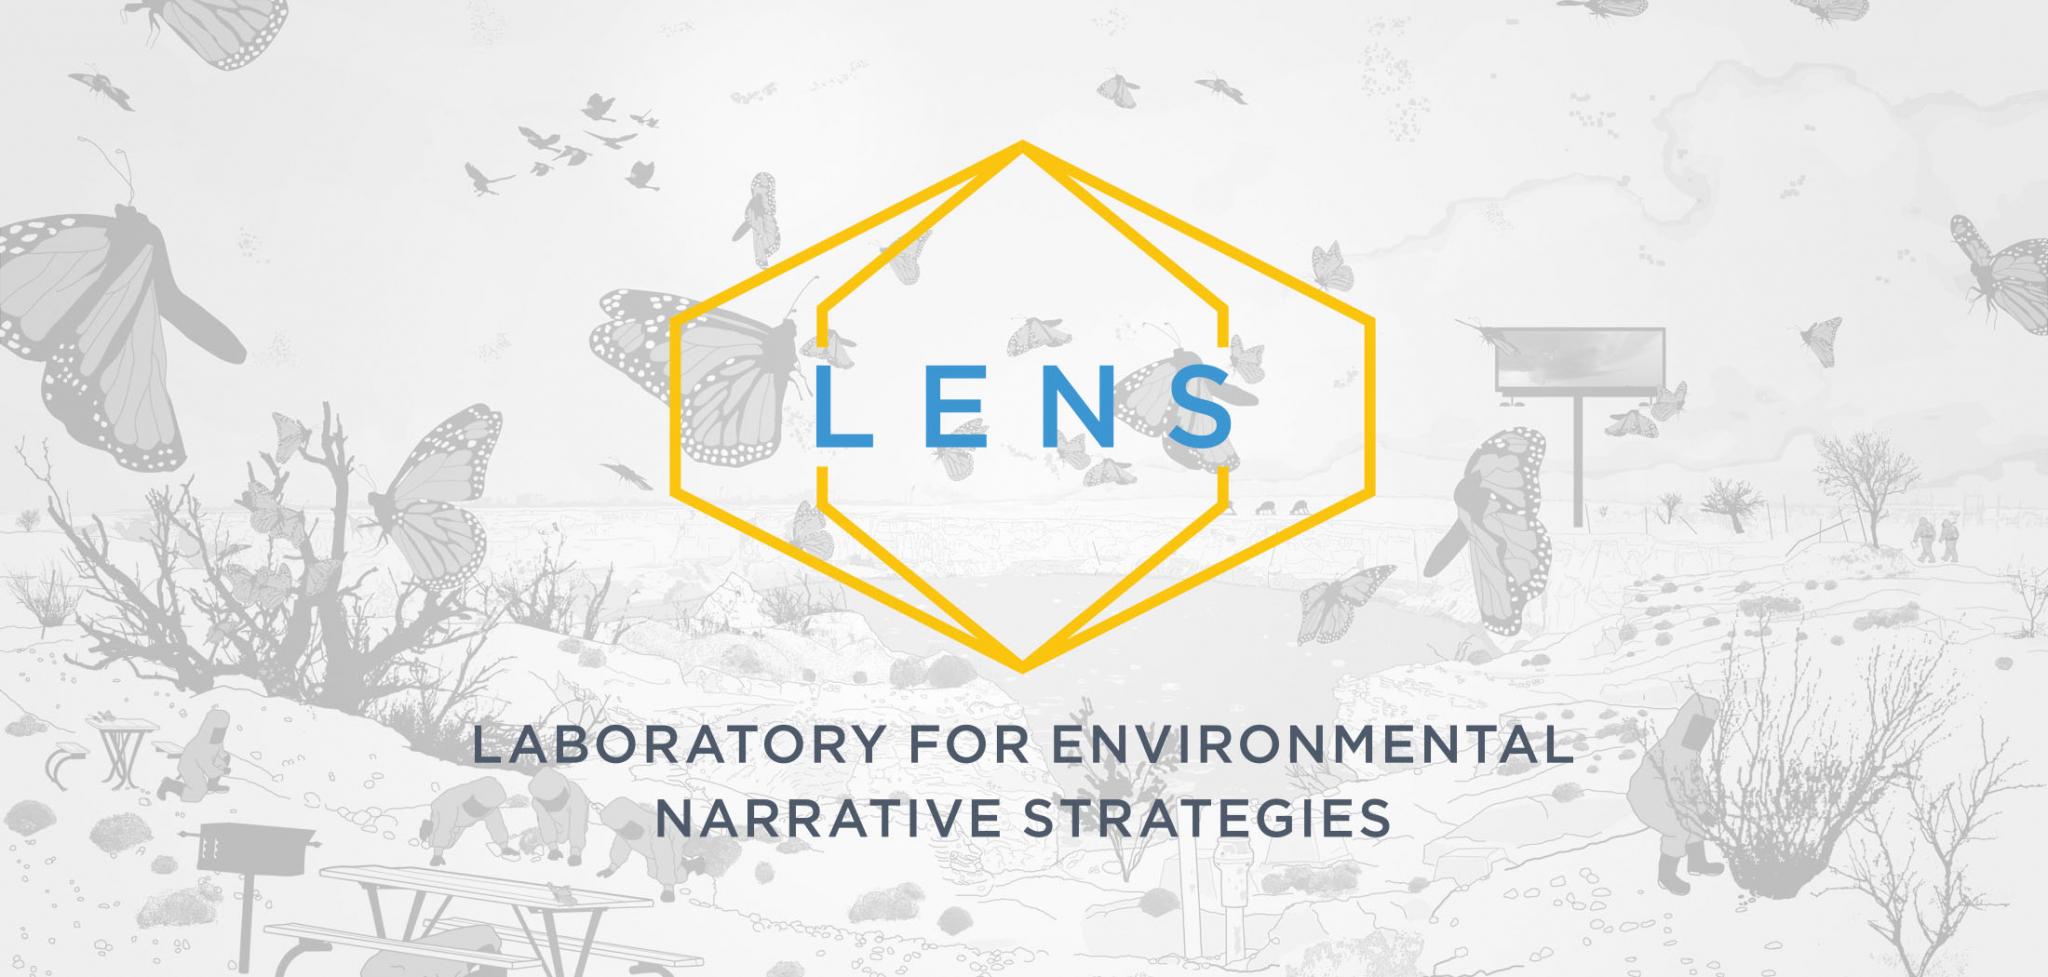 Logo Design for UCLA Lab for Environmental Narrative Strategies